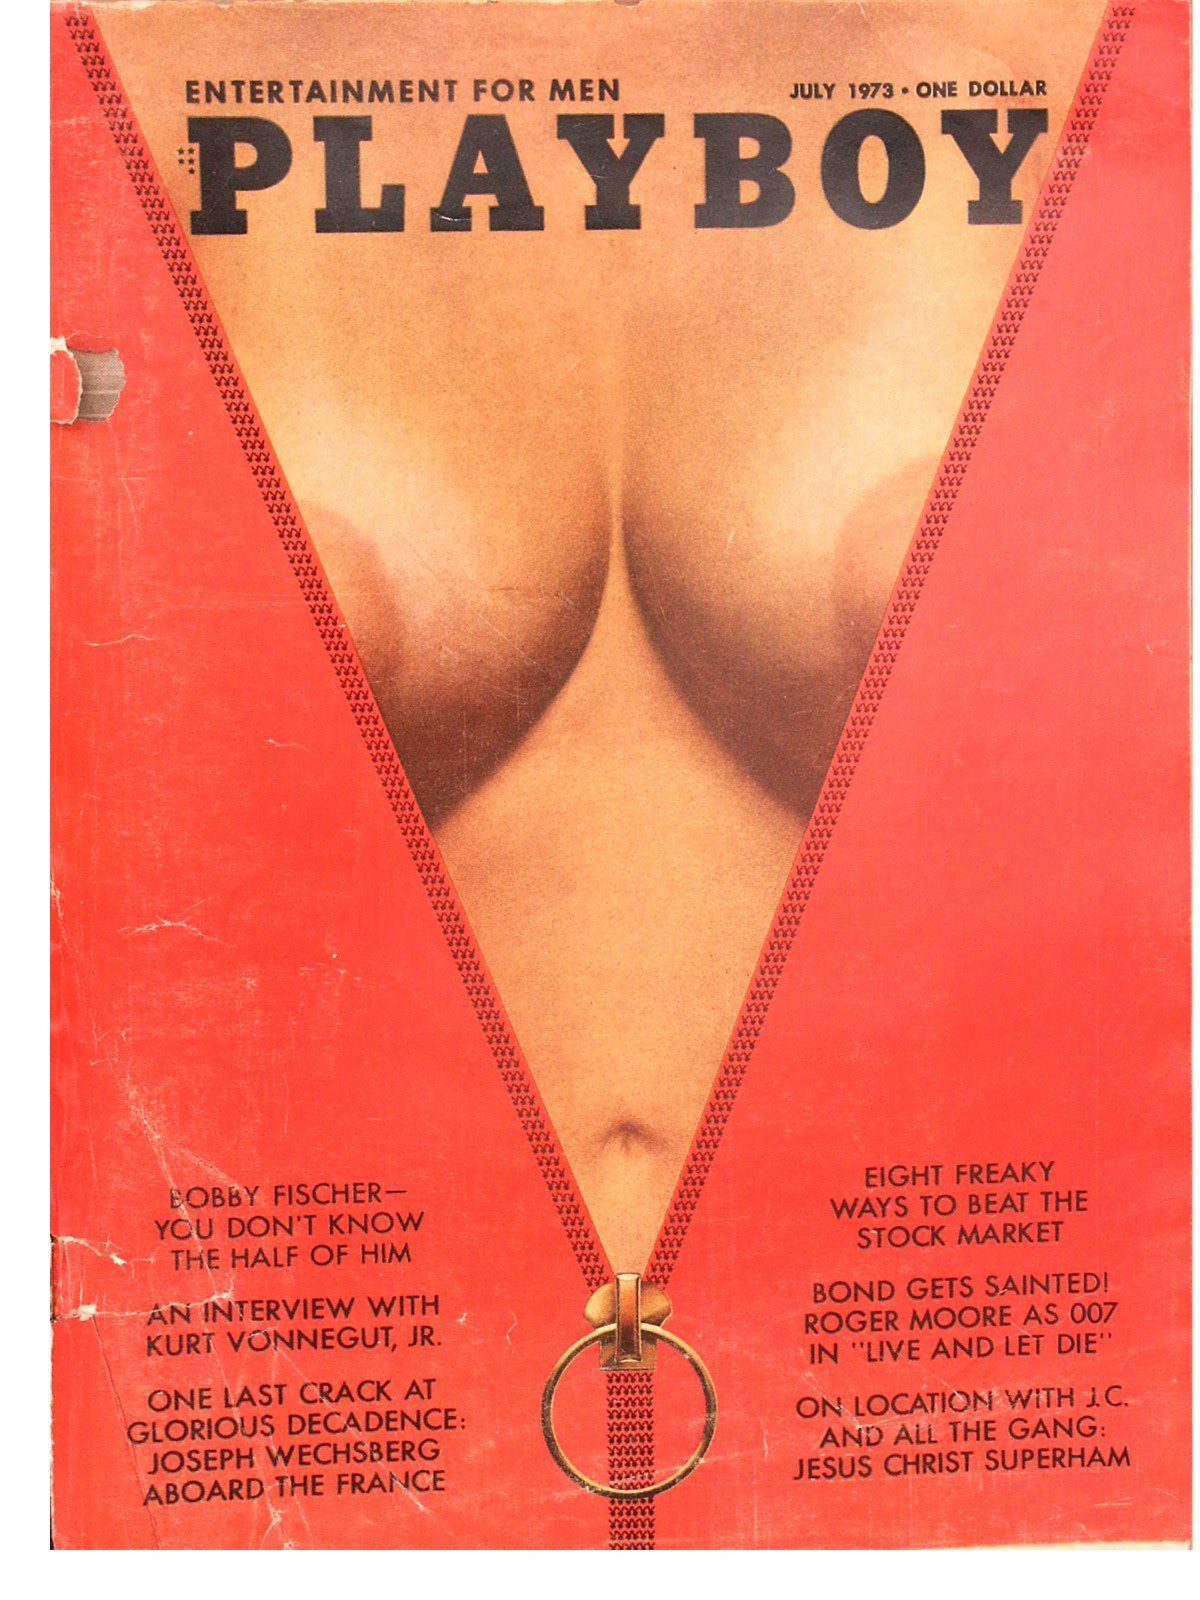 Playboy, 1973